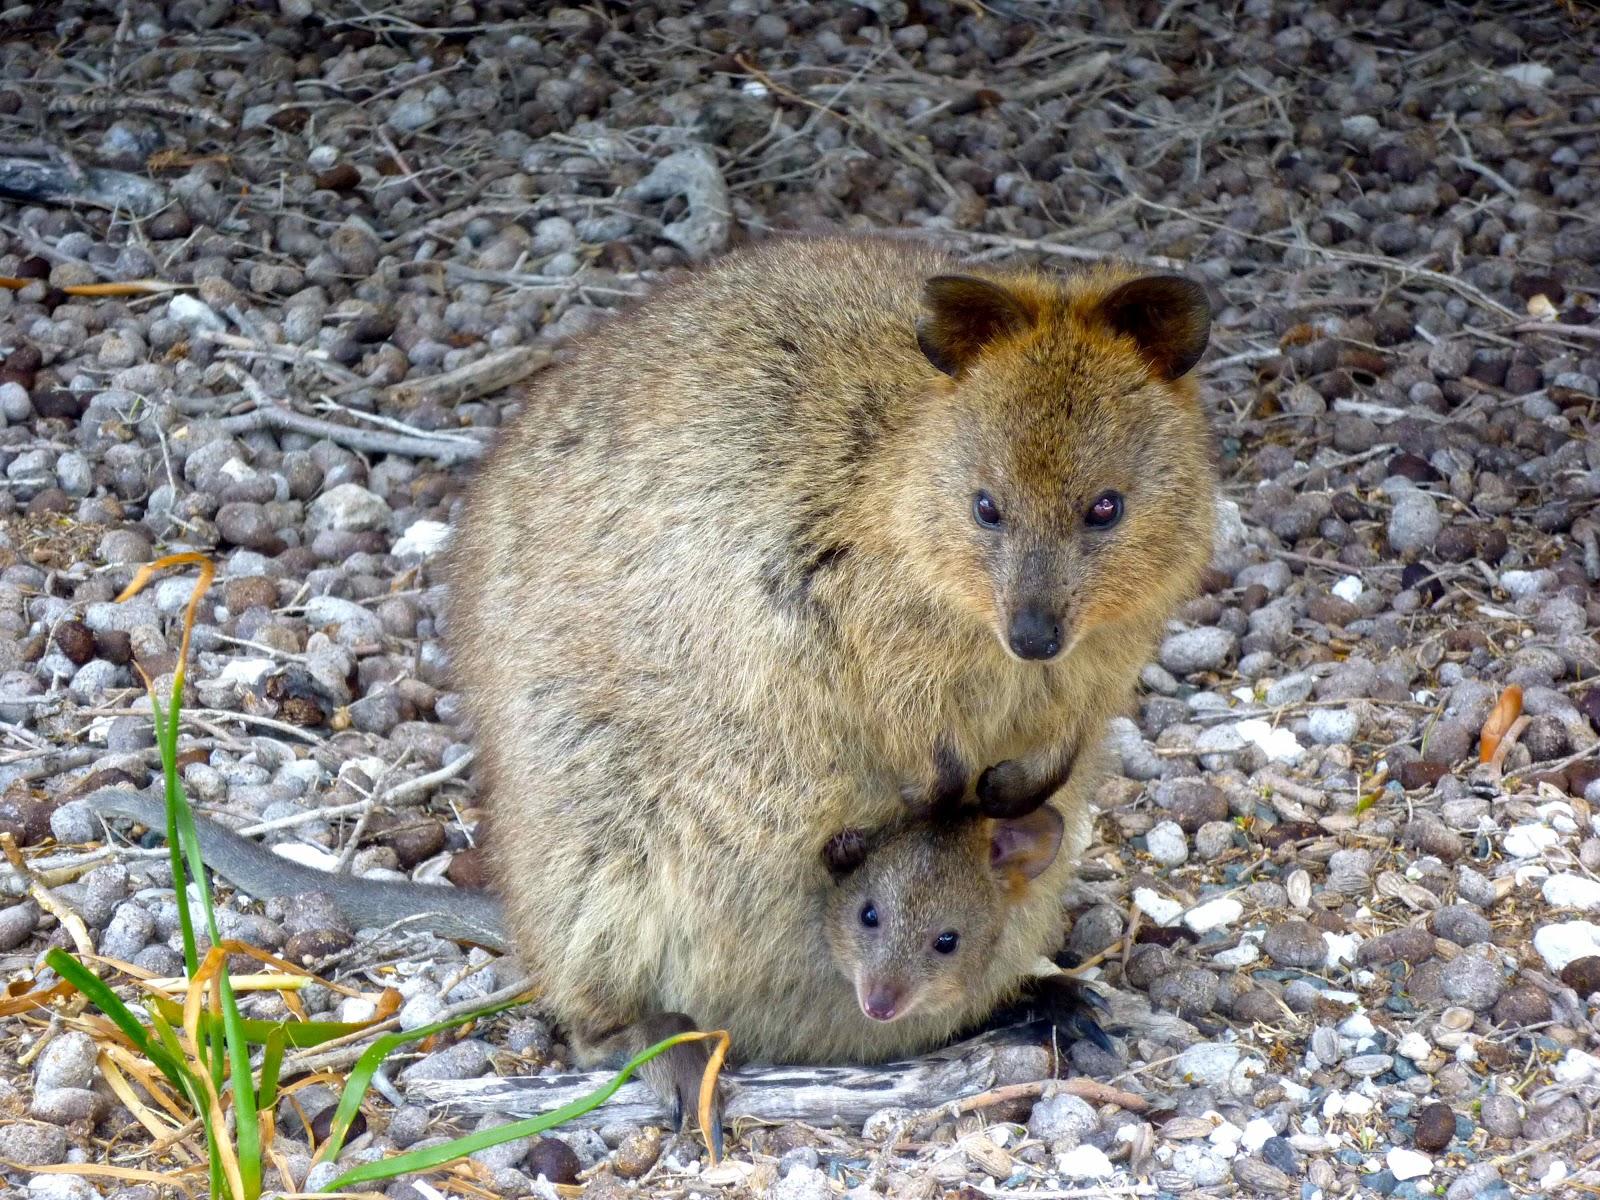 Quokka | Wild Life Animal